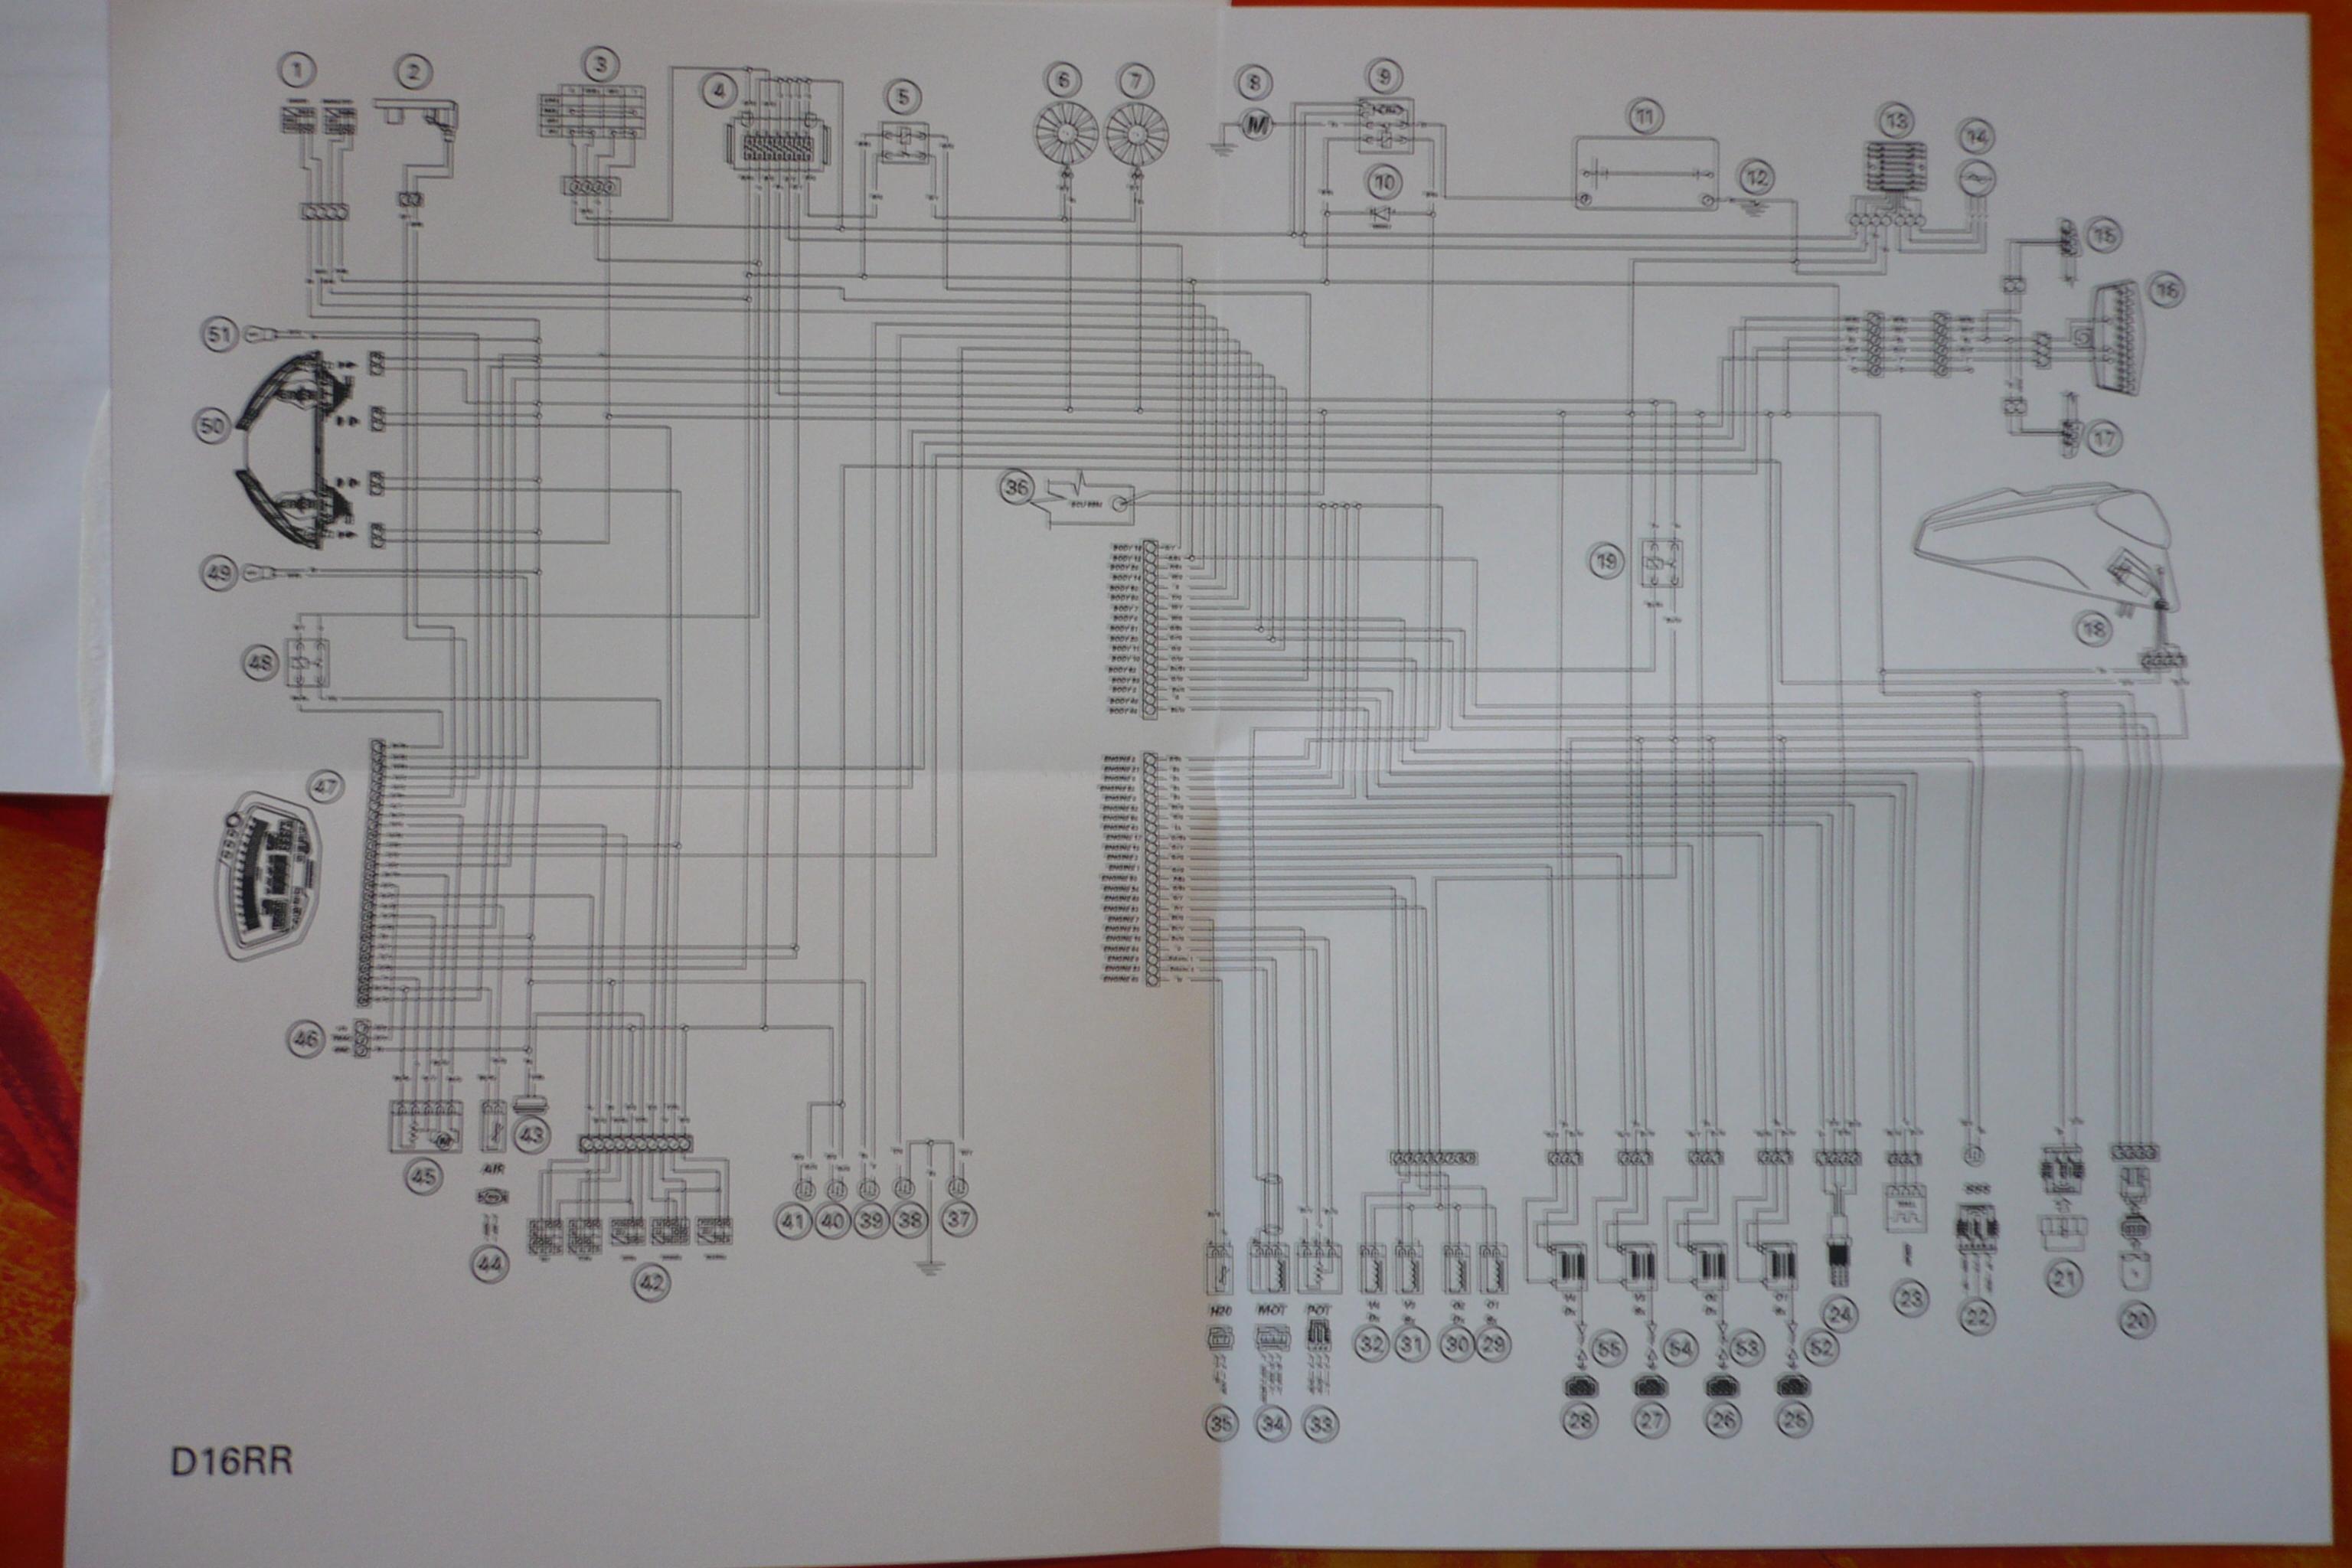 wiring diagram 2002 ducati - rj45 wiring diagram 2 pair for wiring diagram  schematics  wiring diagram schematics